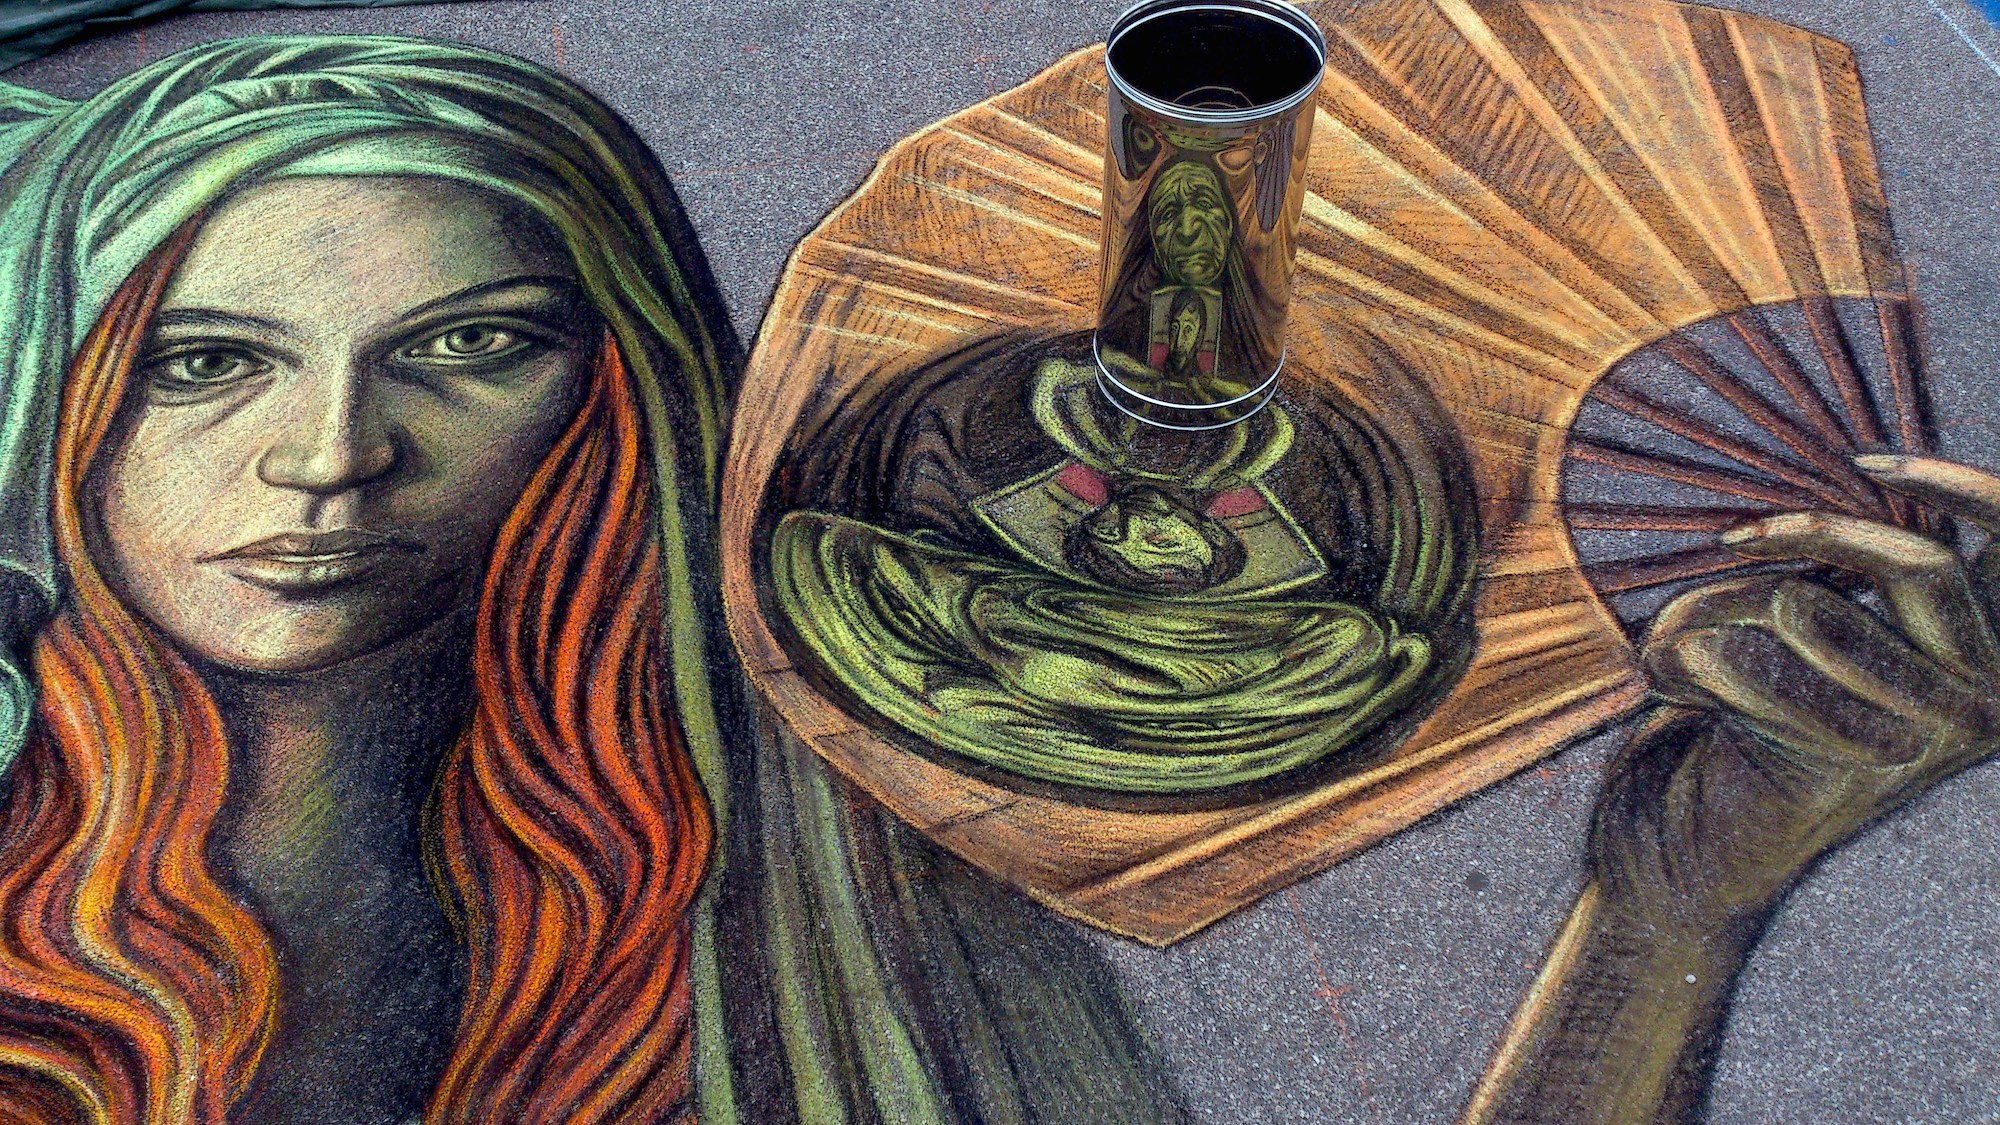 verabugatti madonnari grazie graziedicurtatone madonnaro artedistrada artistidistrada chalk chalkart gessetti gessetto pastel asphalt pavementart anamorfosi strassenmalerei